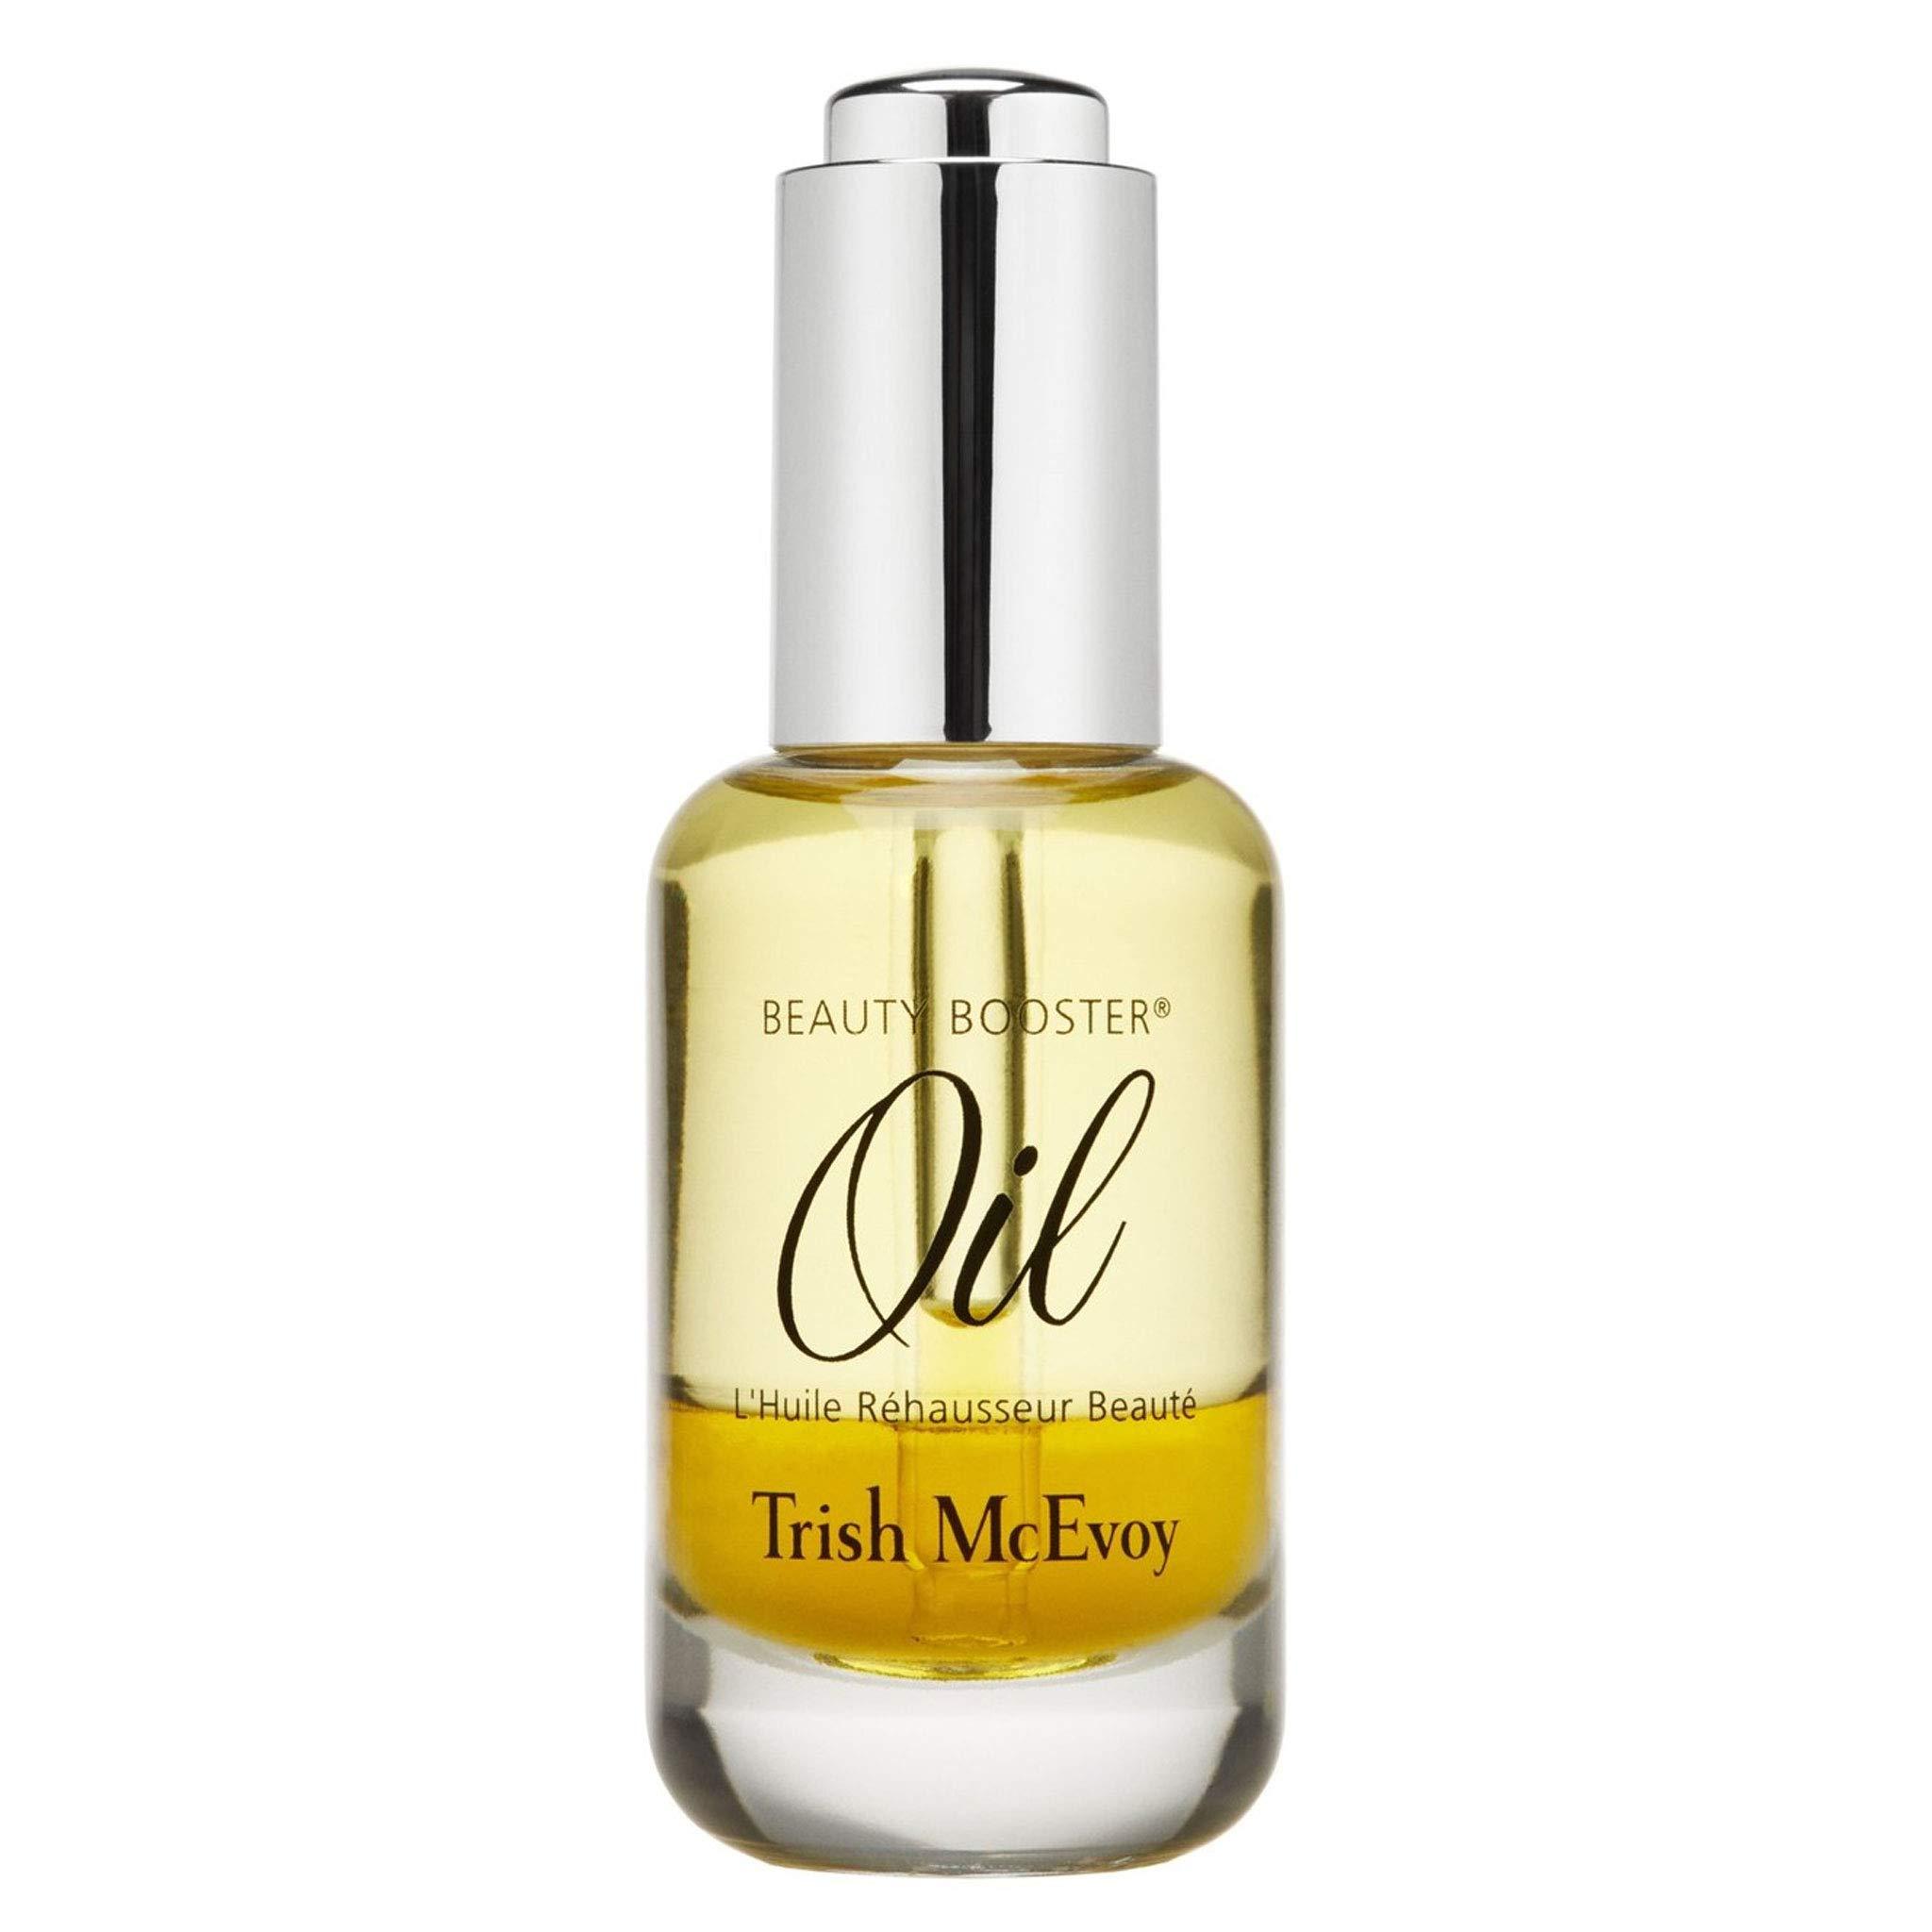 Trish McEvoy Beauty Booster Oil 1oz (30ml)